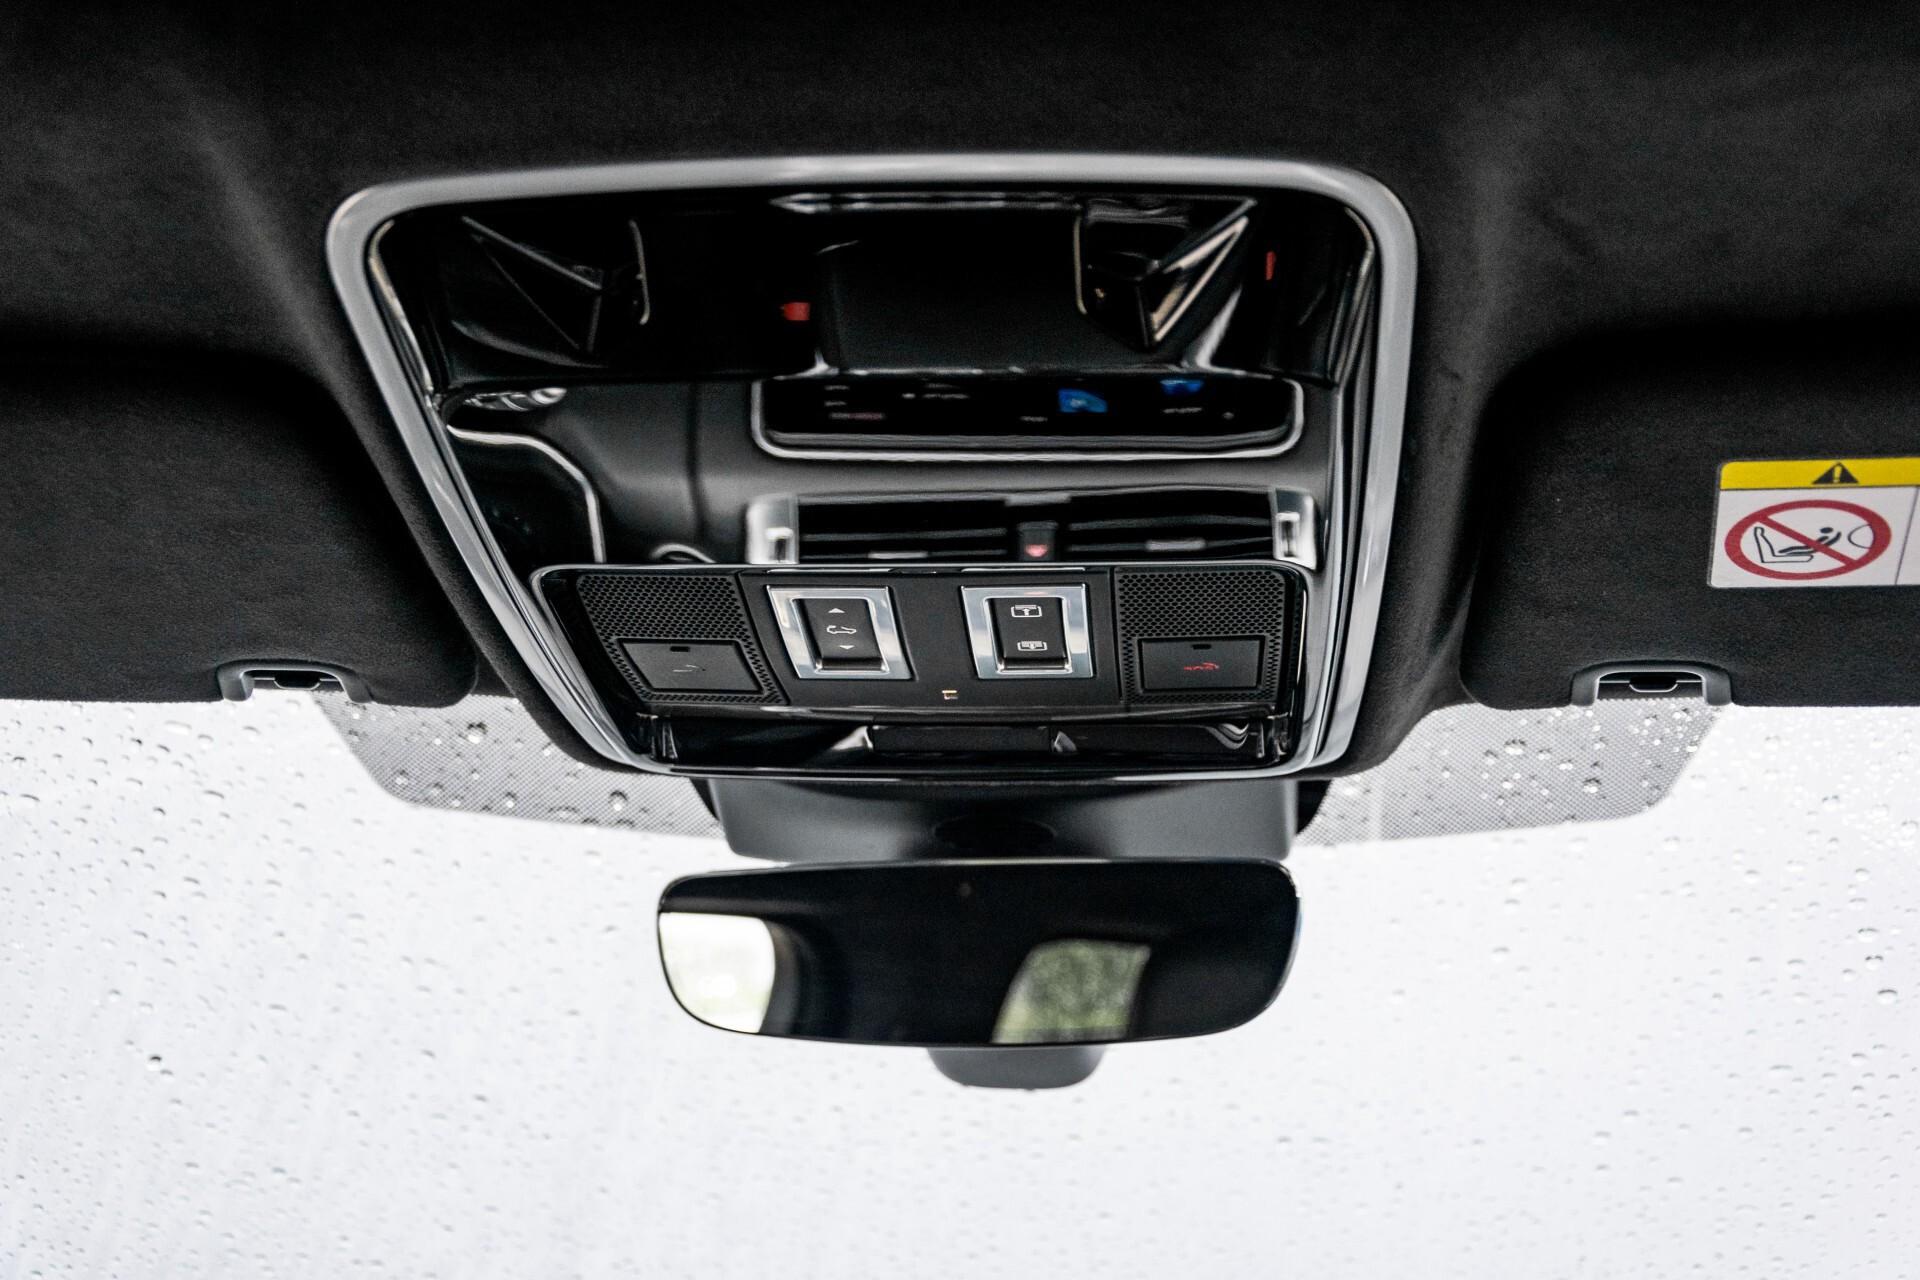 Land Rover Range Rover Sport SVR 5.0 Supercharged 575pk Full Carbon Nieuwprijs €241377 Foto 51